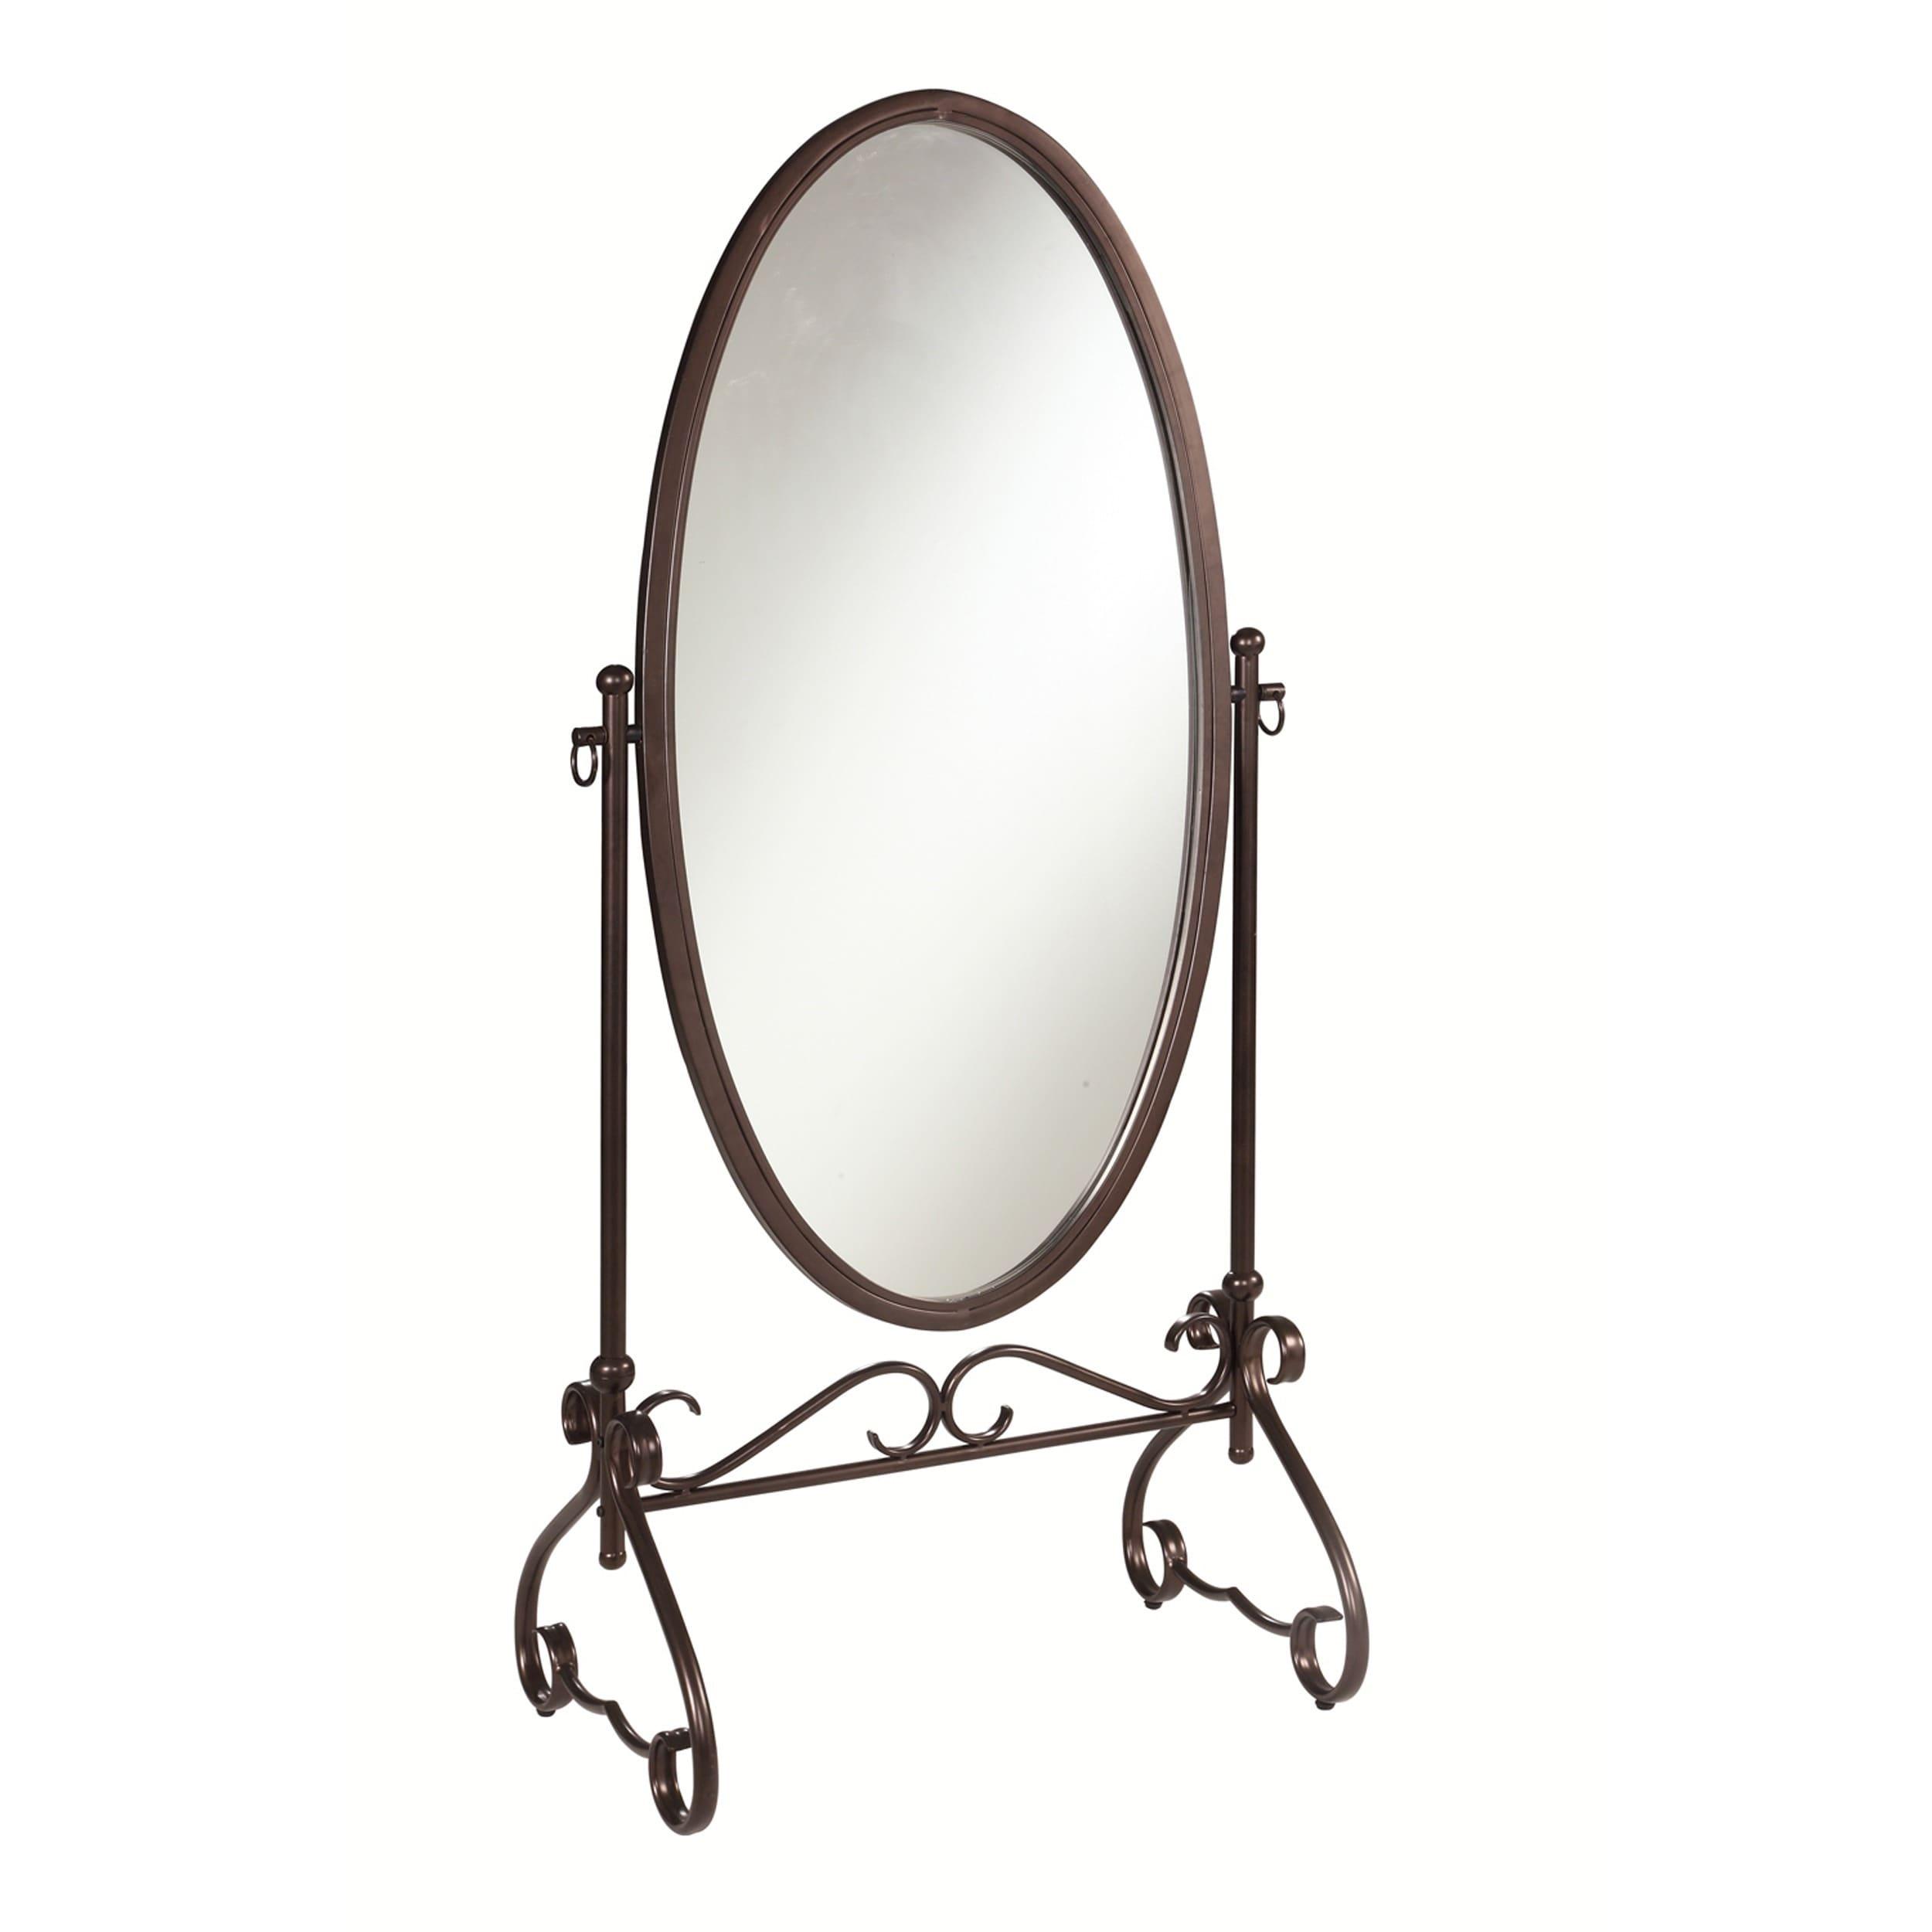 Super Linon Angelica 26 x 63-inch Metal Oval Cheval Mirror - Antique  VL04